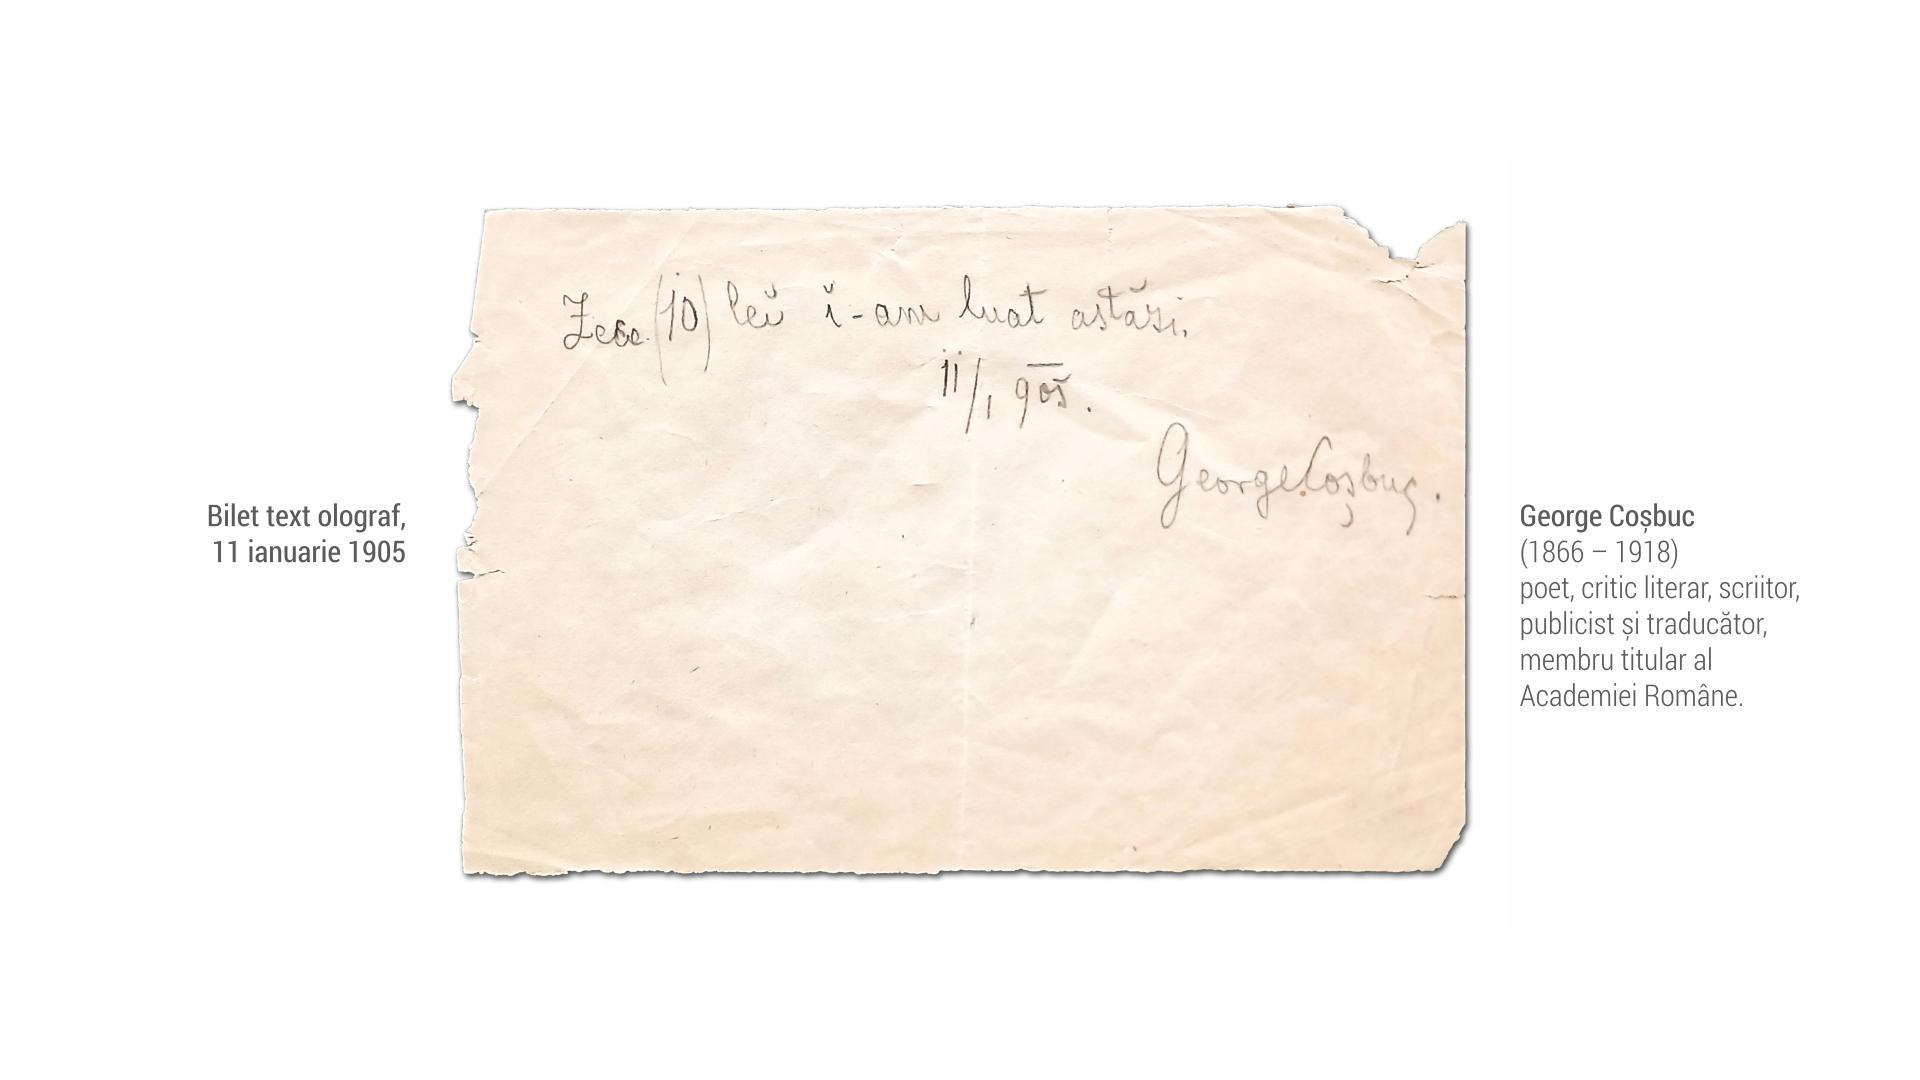 1866 George Cosbuc - bilet